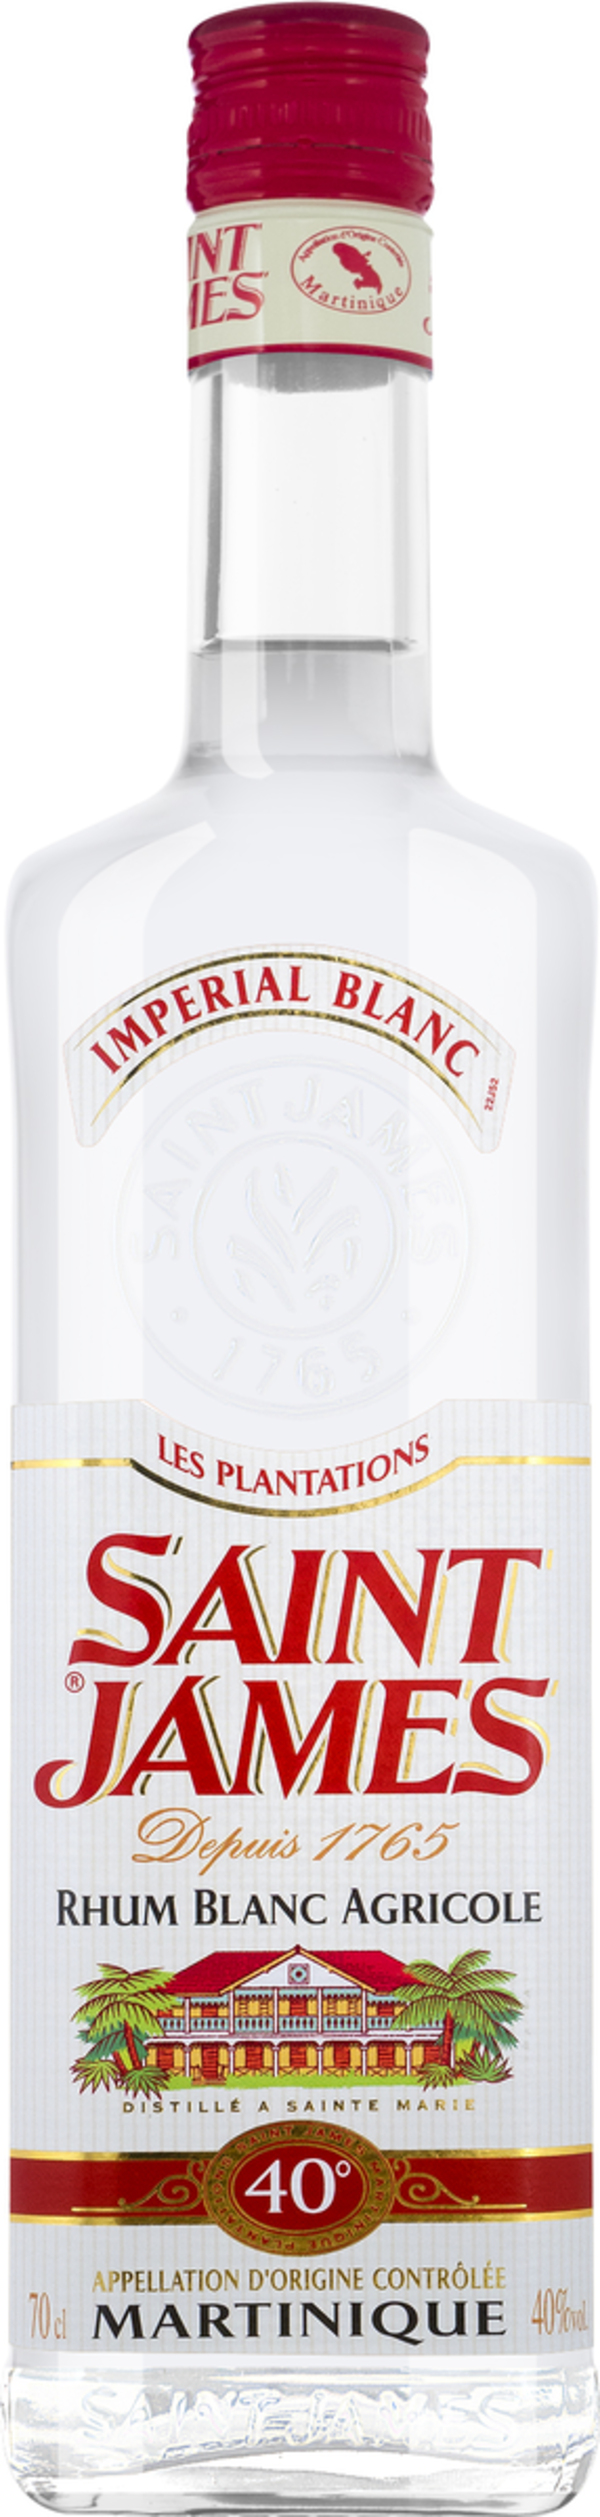 Saint James Imperial Blanc Rhum Blanc Agricole   - Rum, Martinique, trocken, 0,7l